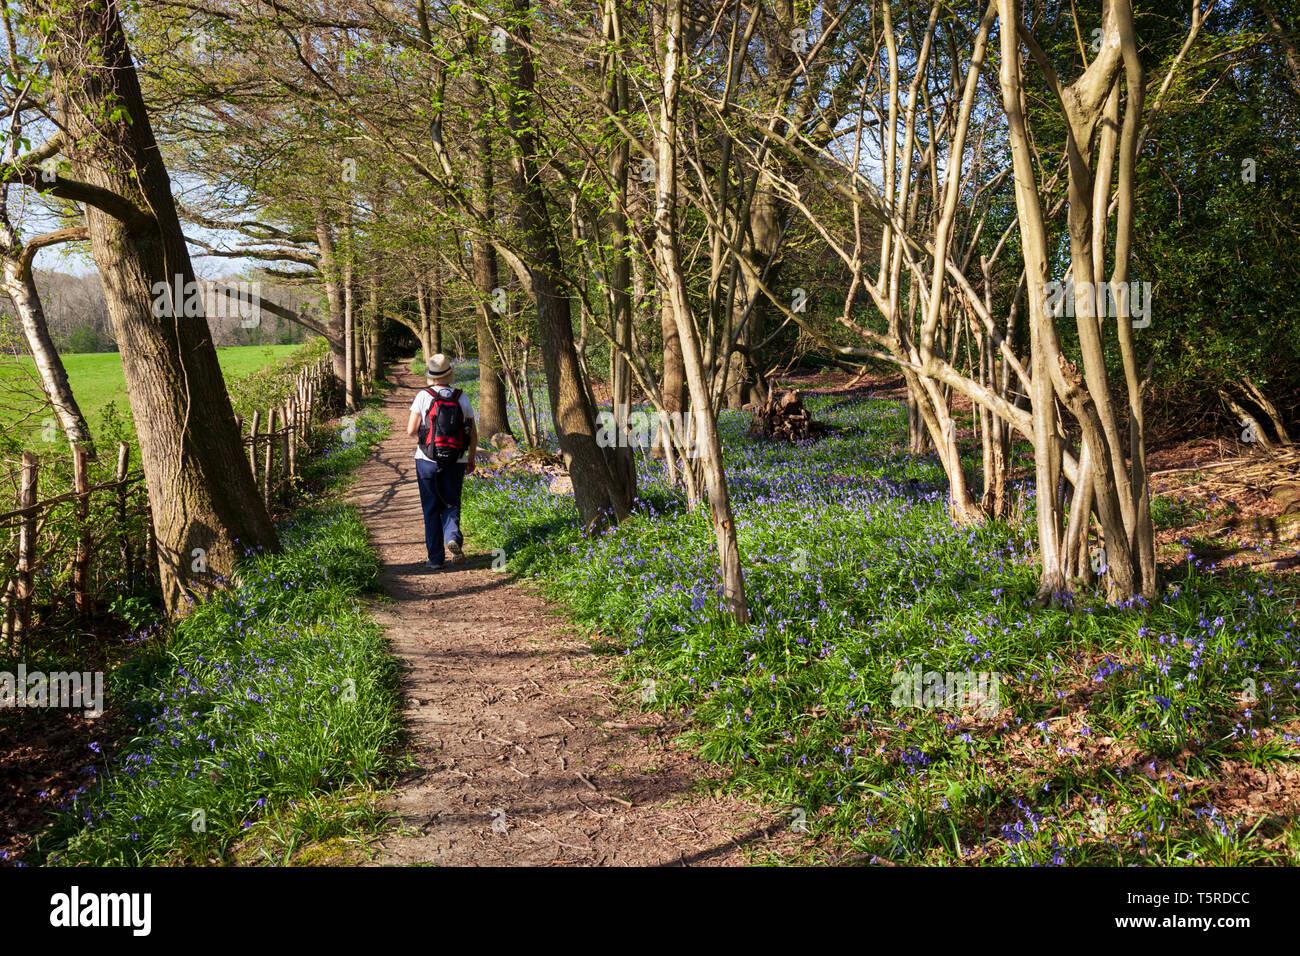 Footpath through bluebell woods in the Ashdown Forest near Danehill, near Haywards Heath, Sussex, England, United Kingdom, Europe - Stock Image